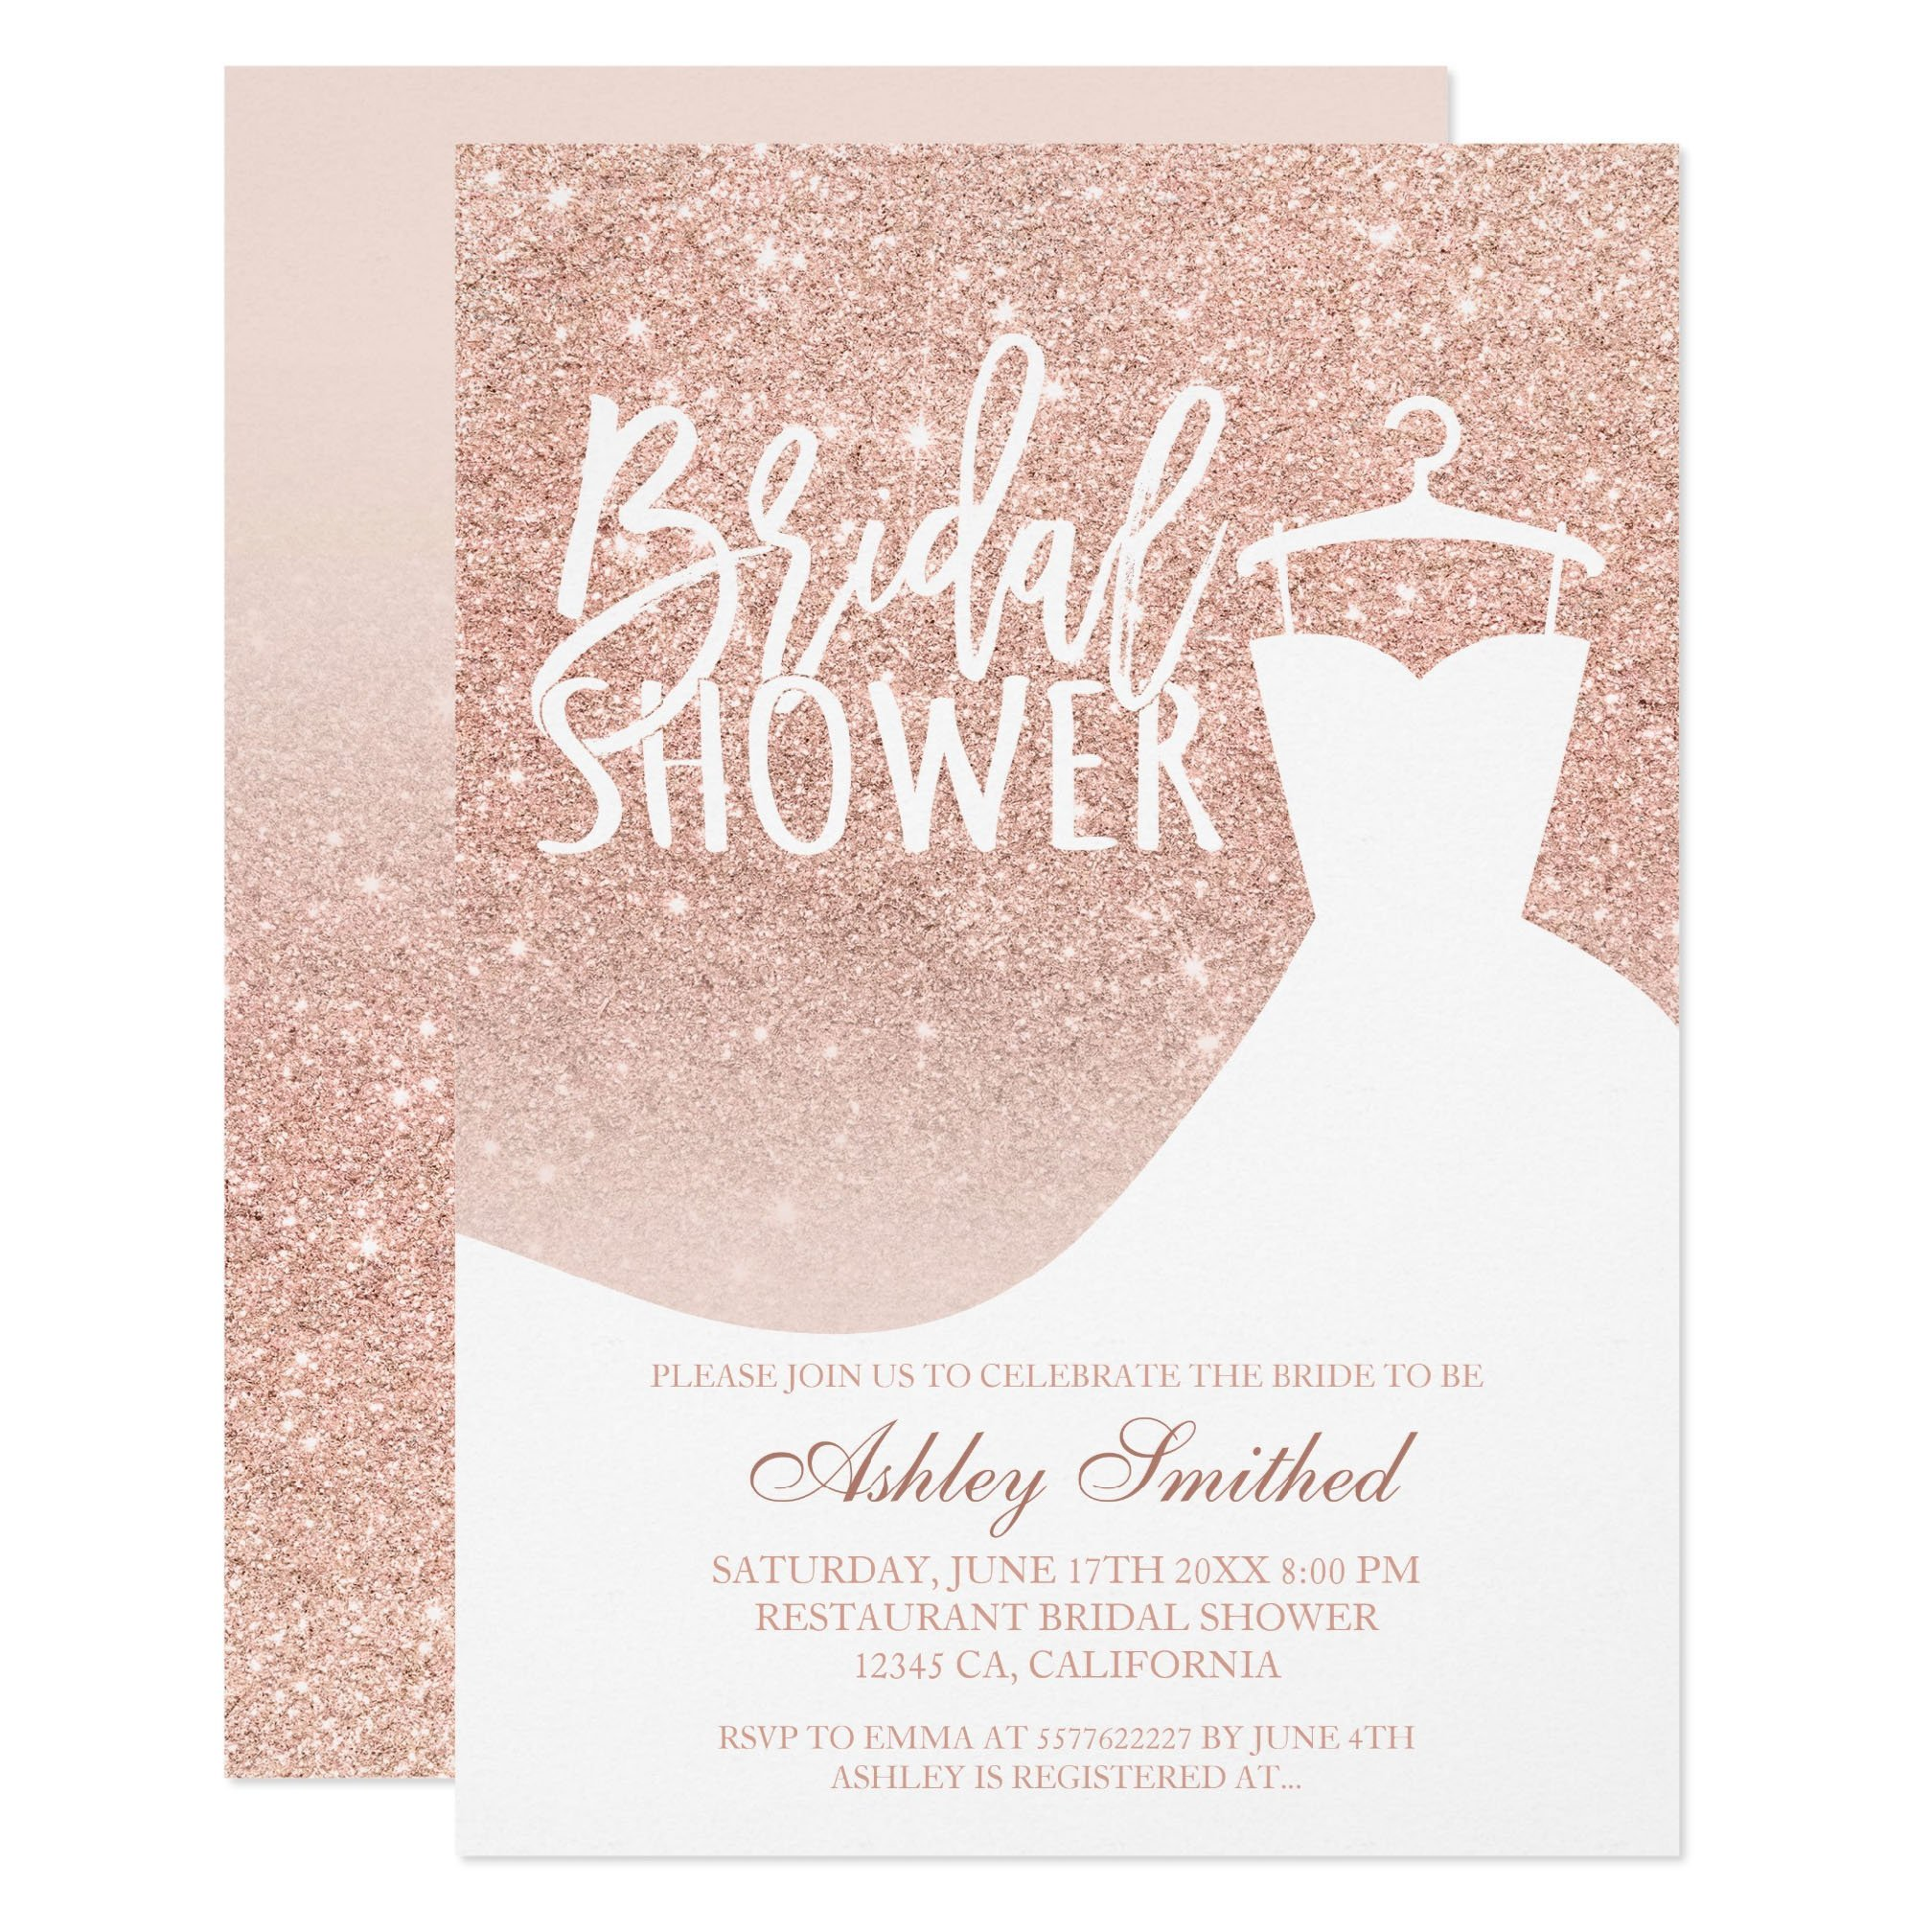 Rose gold glitter elegant chic dress Bridal shower printable Invitation preview zazzle